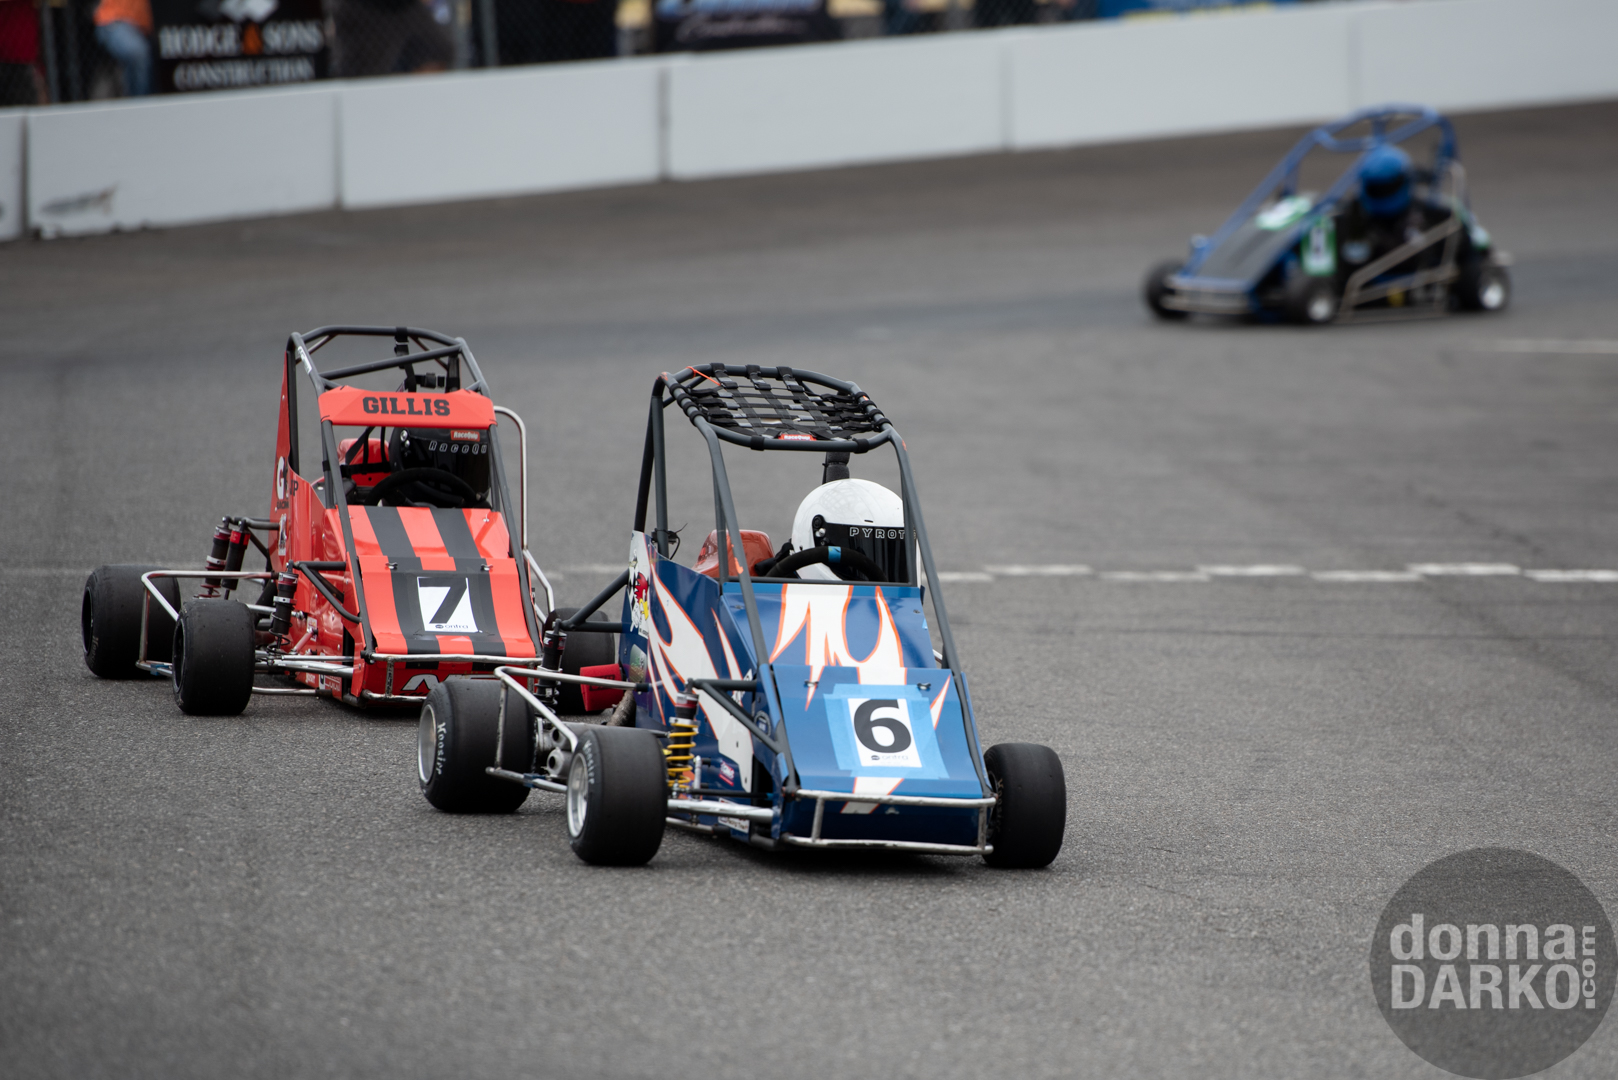 QWMA (Racing) 8-11-2019 DSC_5559.jpg